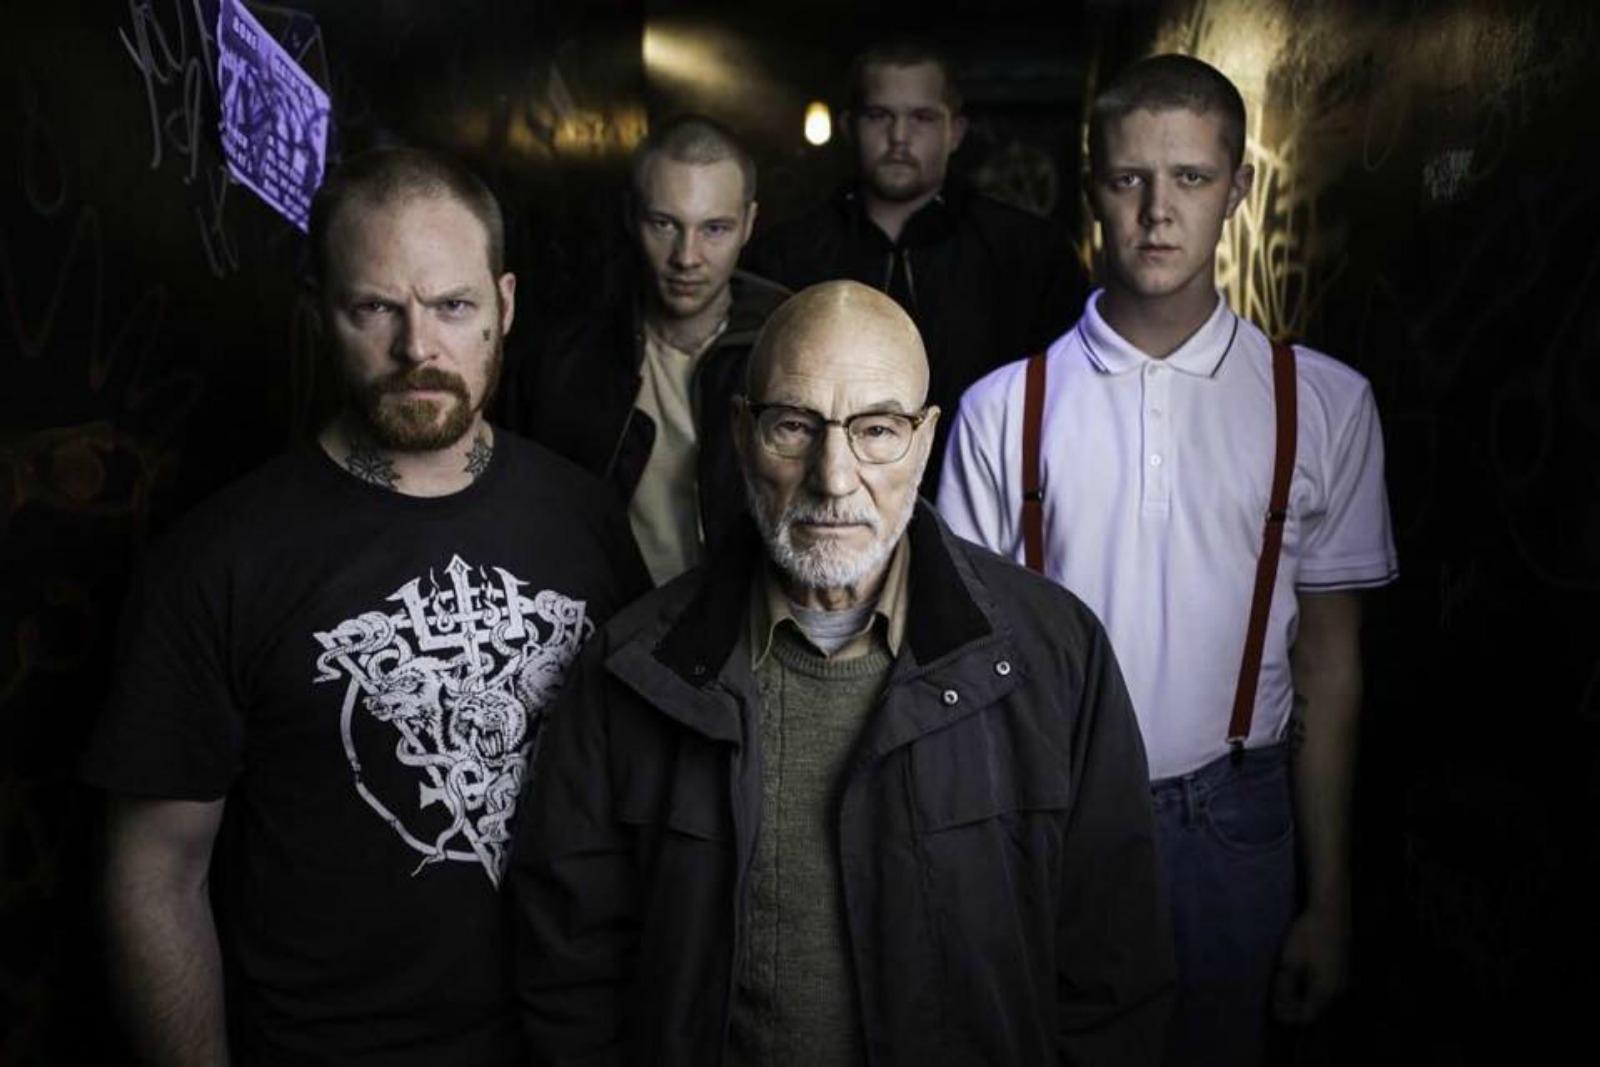 Green room » : un thriller ébouriffant opposant skins et punks